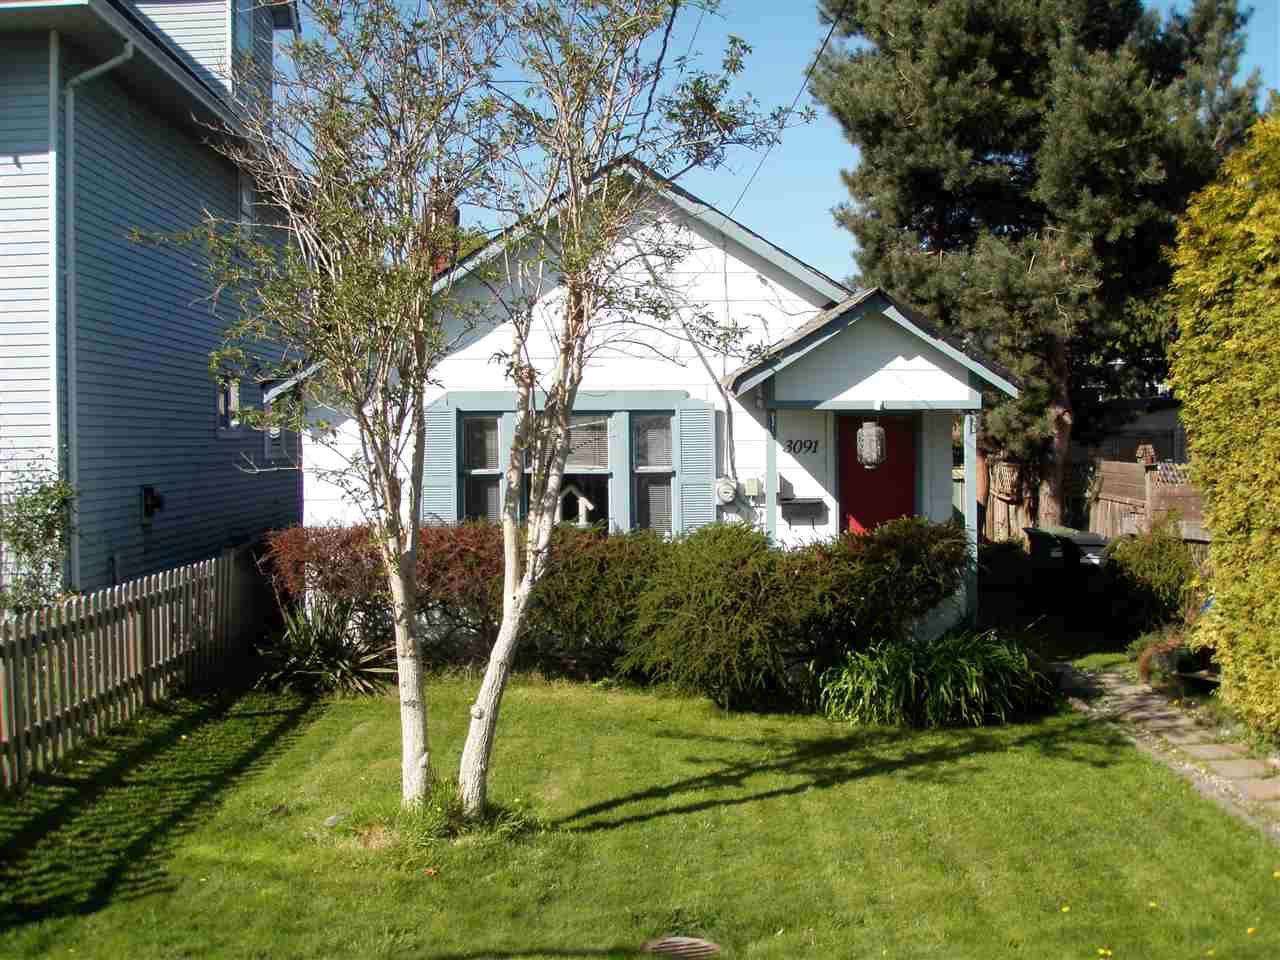 Main Photo: 3091 CHATHAM STREET in Richmond: Steveston Village House for sale : MLS®# R2140804